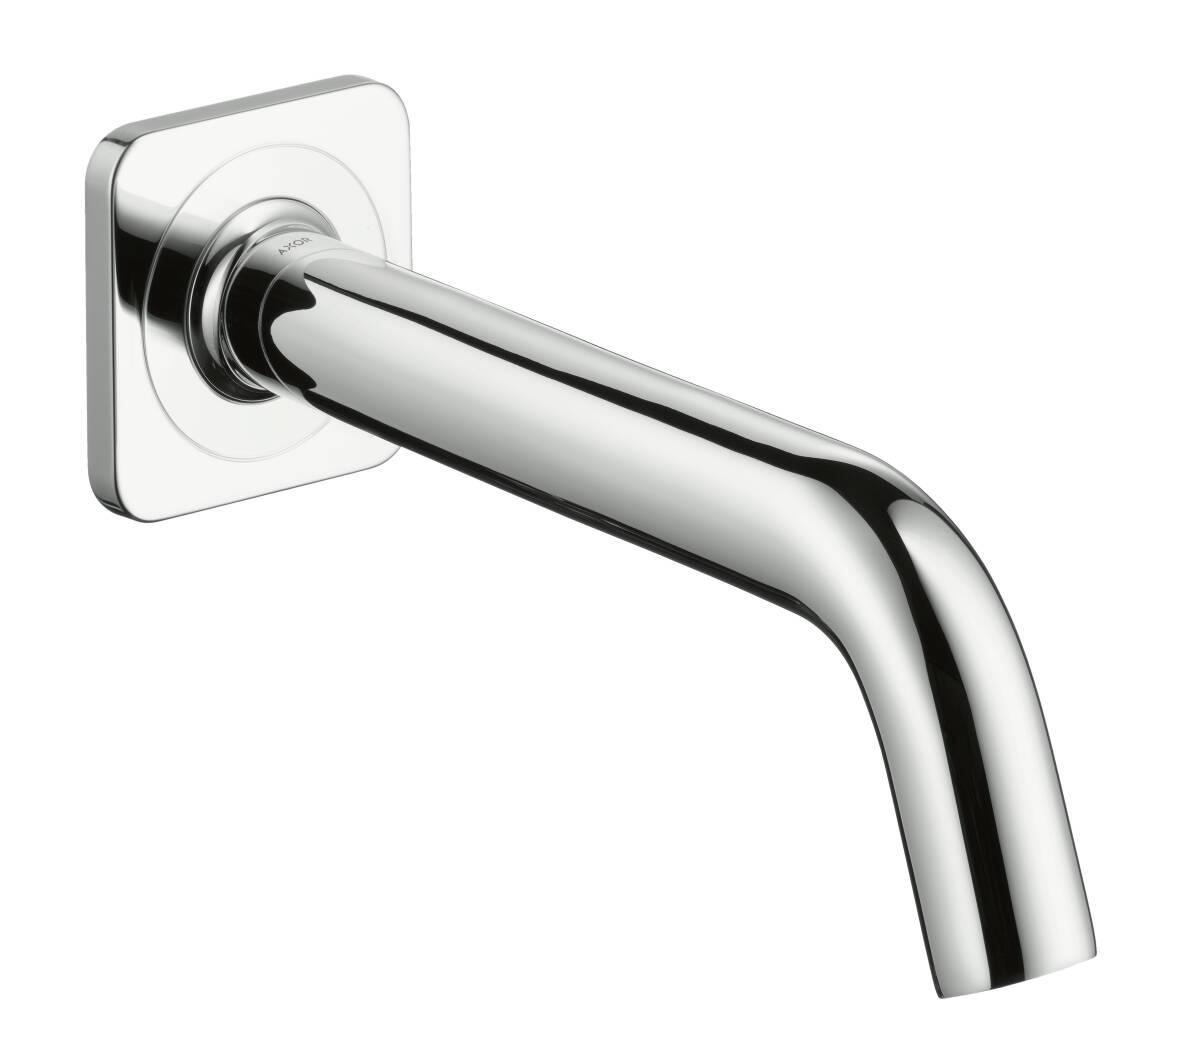 Bath Spout, Polished Black Chrome, 34410330